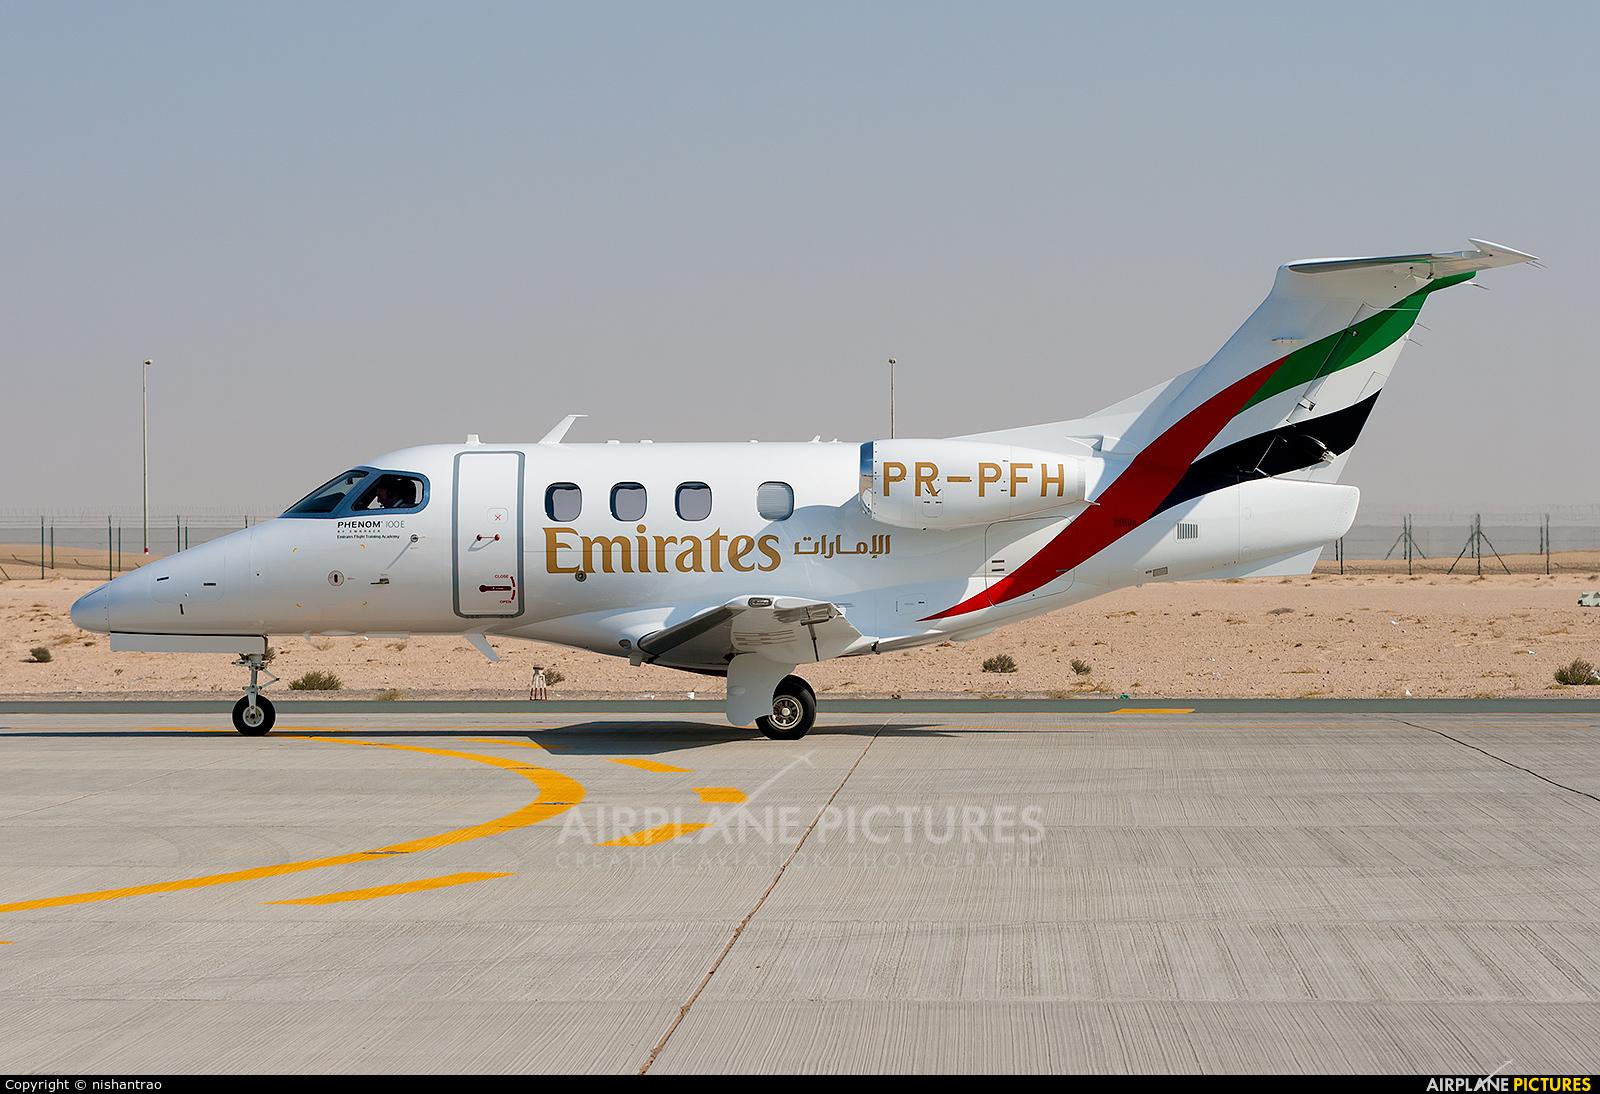 Emirates Airlines PR-PFH aircraft at Jebel Ali Al Maktoum Intl